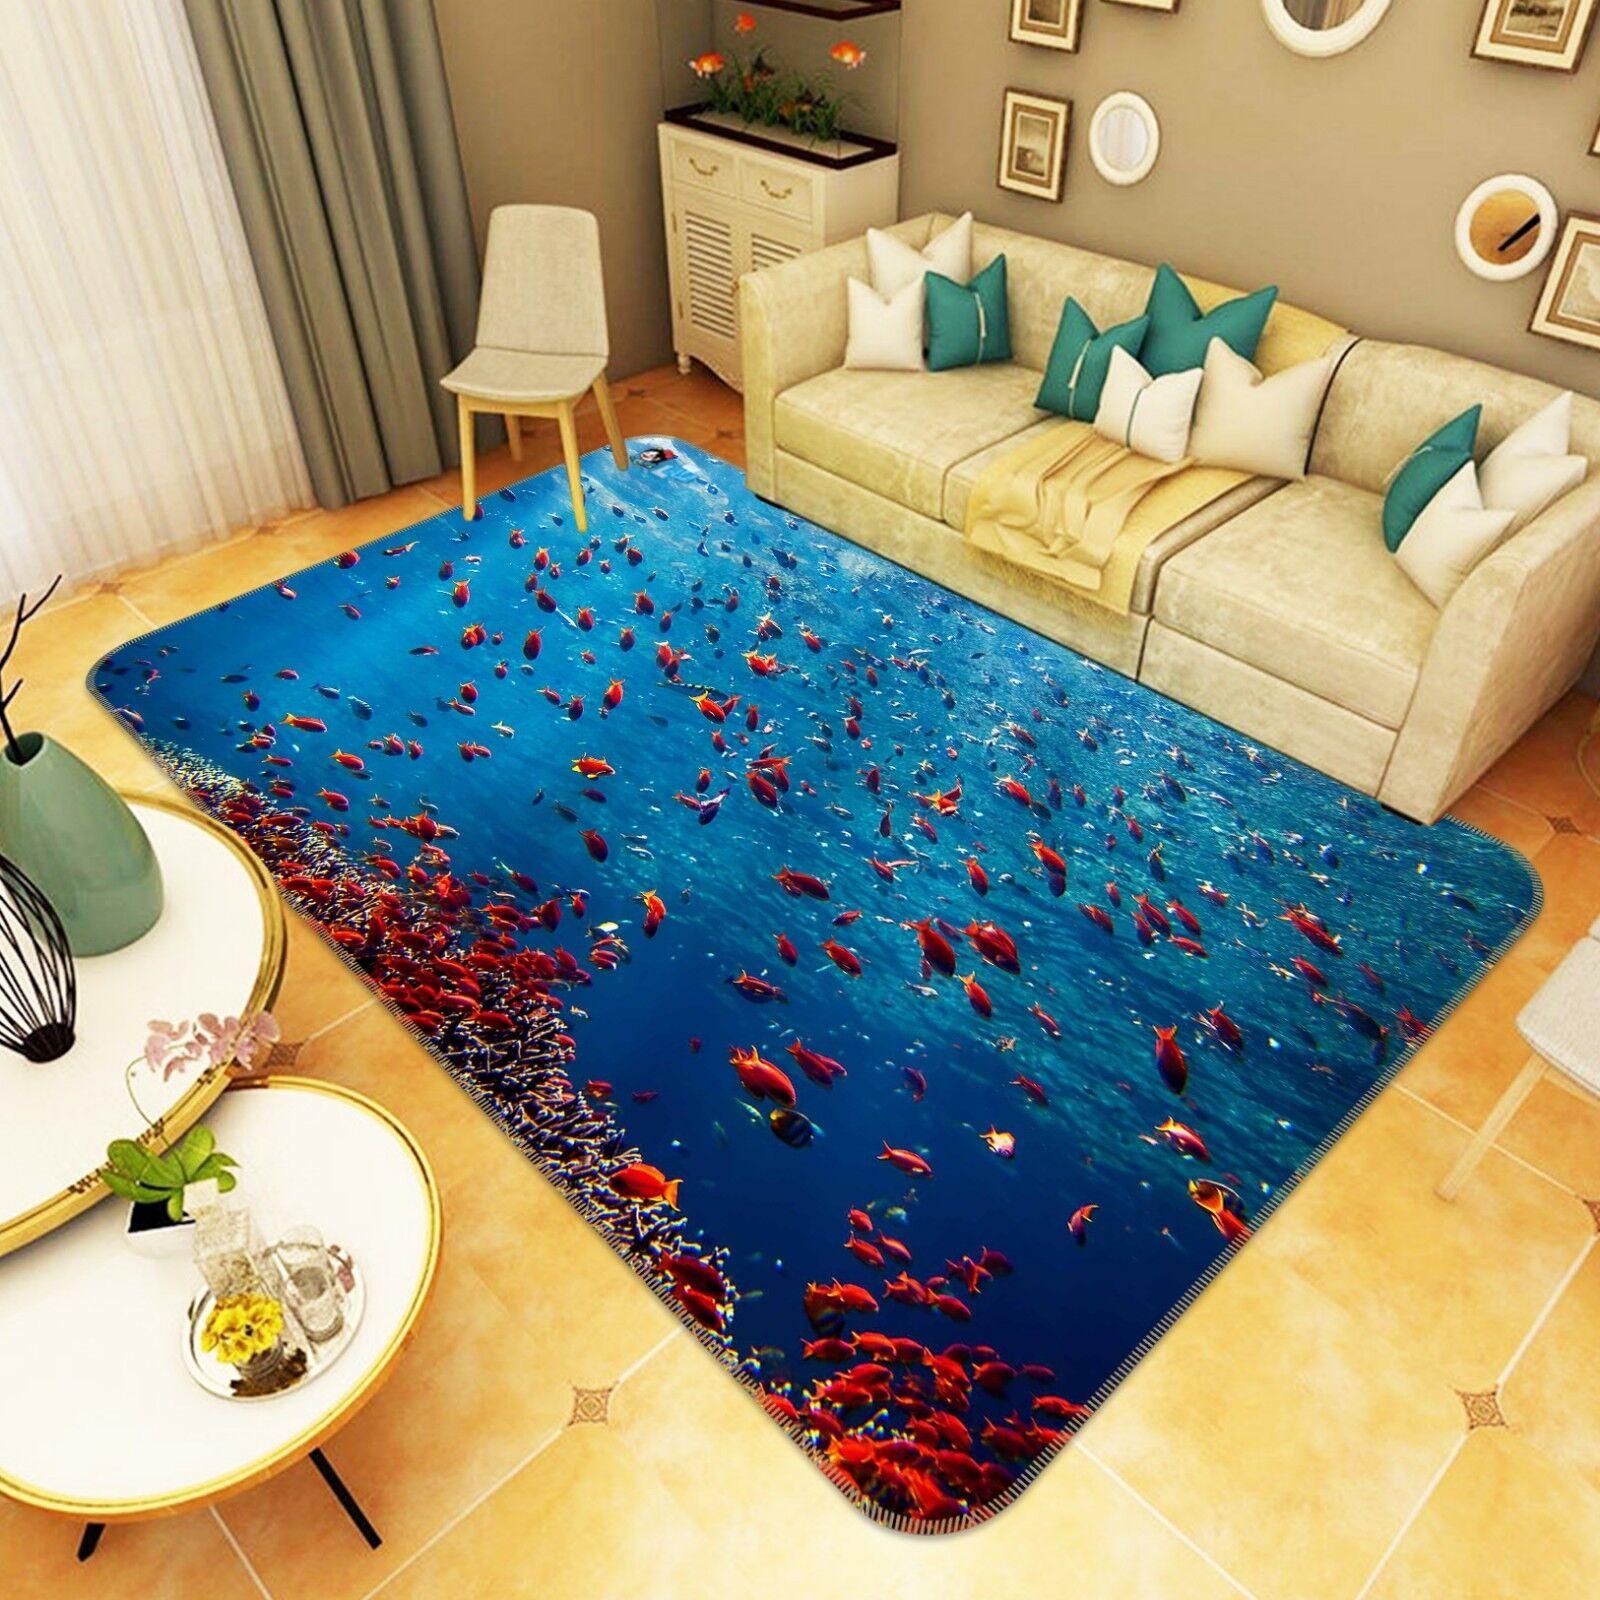 3D Pesce densa gruppi 4 tappetino antiscivolo tappeto camera Tappetino Qualità Elegante foto Tappeto UK